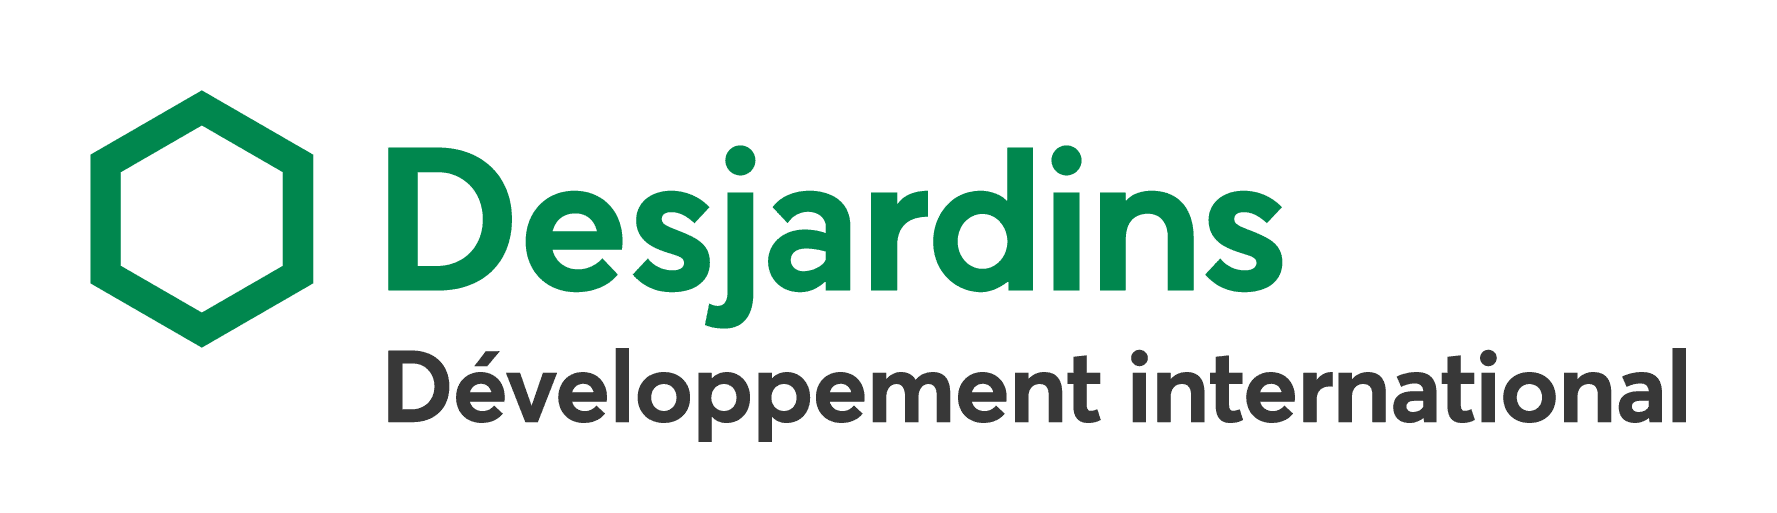 Développement international Desjardins